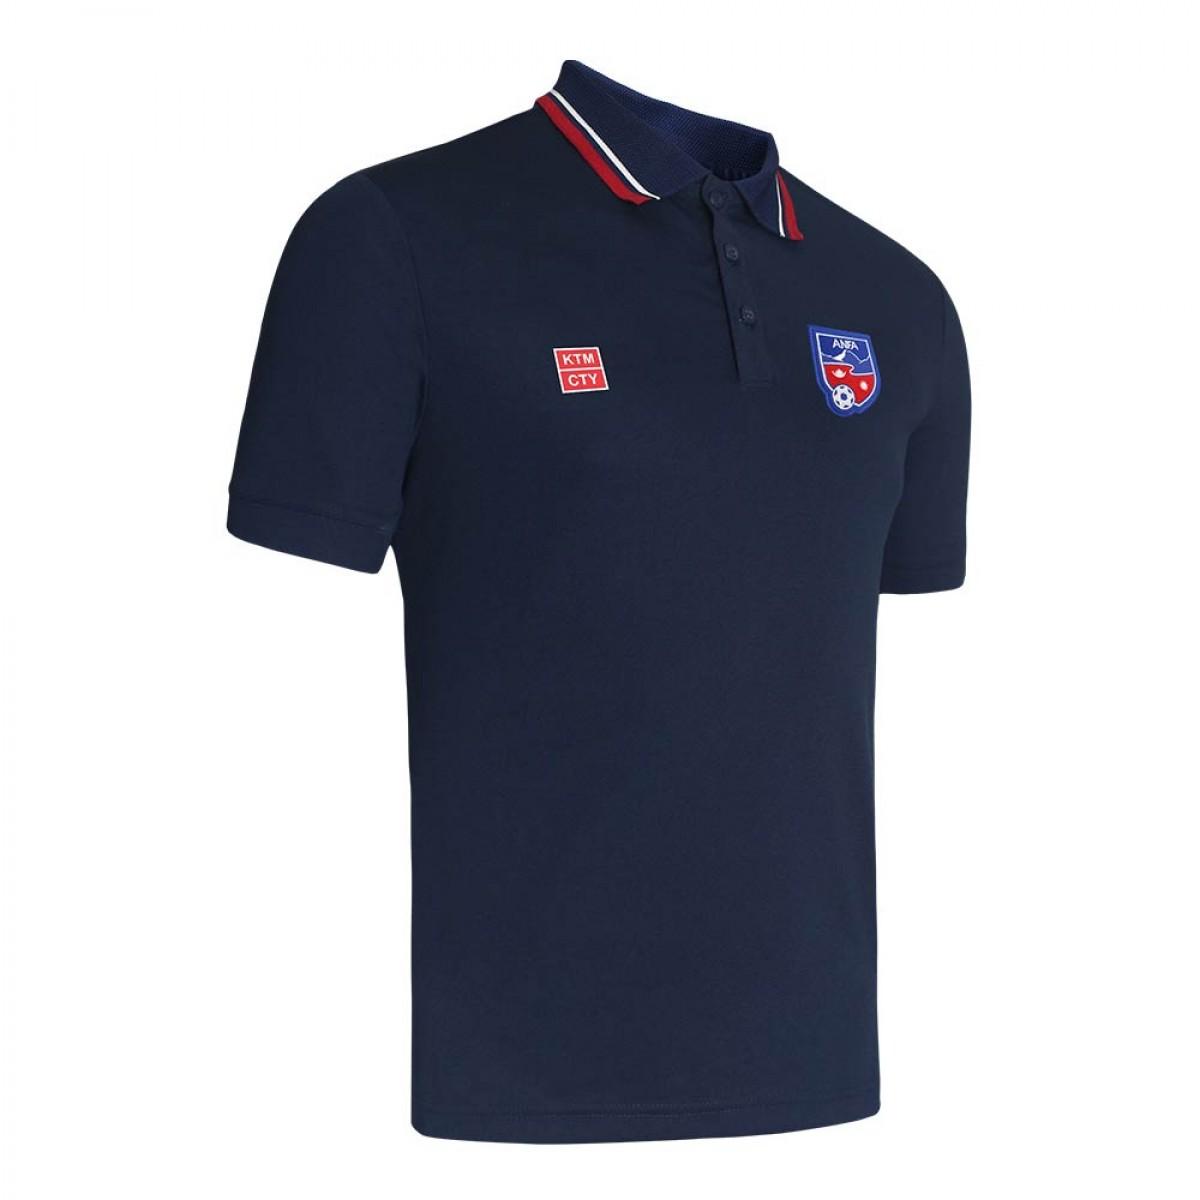 anfa-polo-t-shirt-apt5123-5a